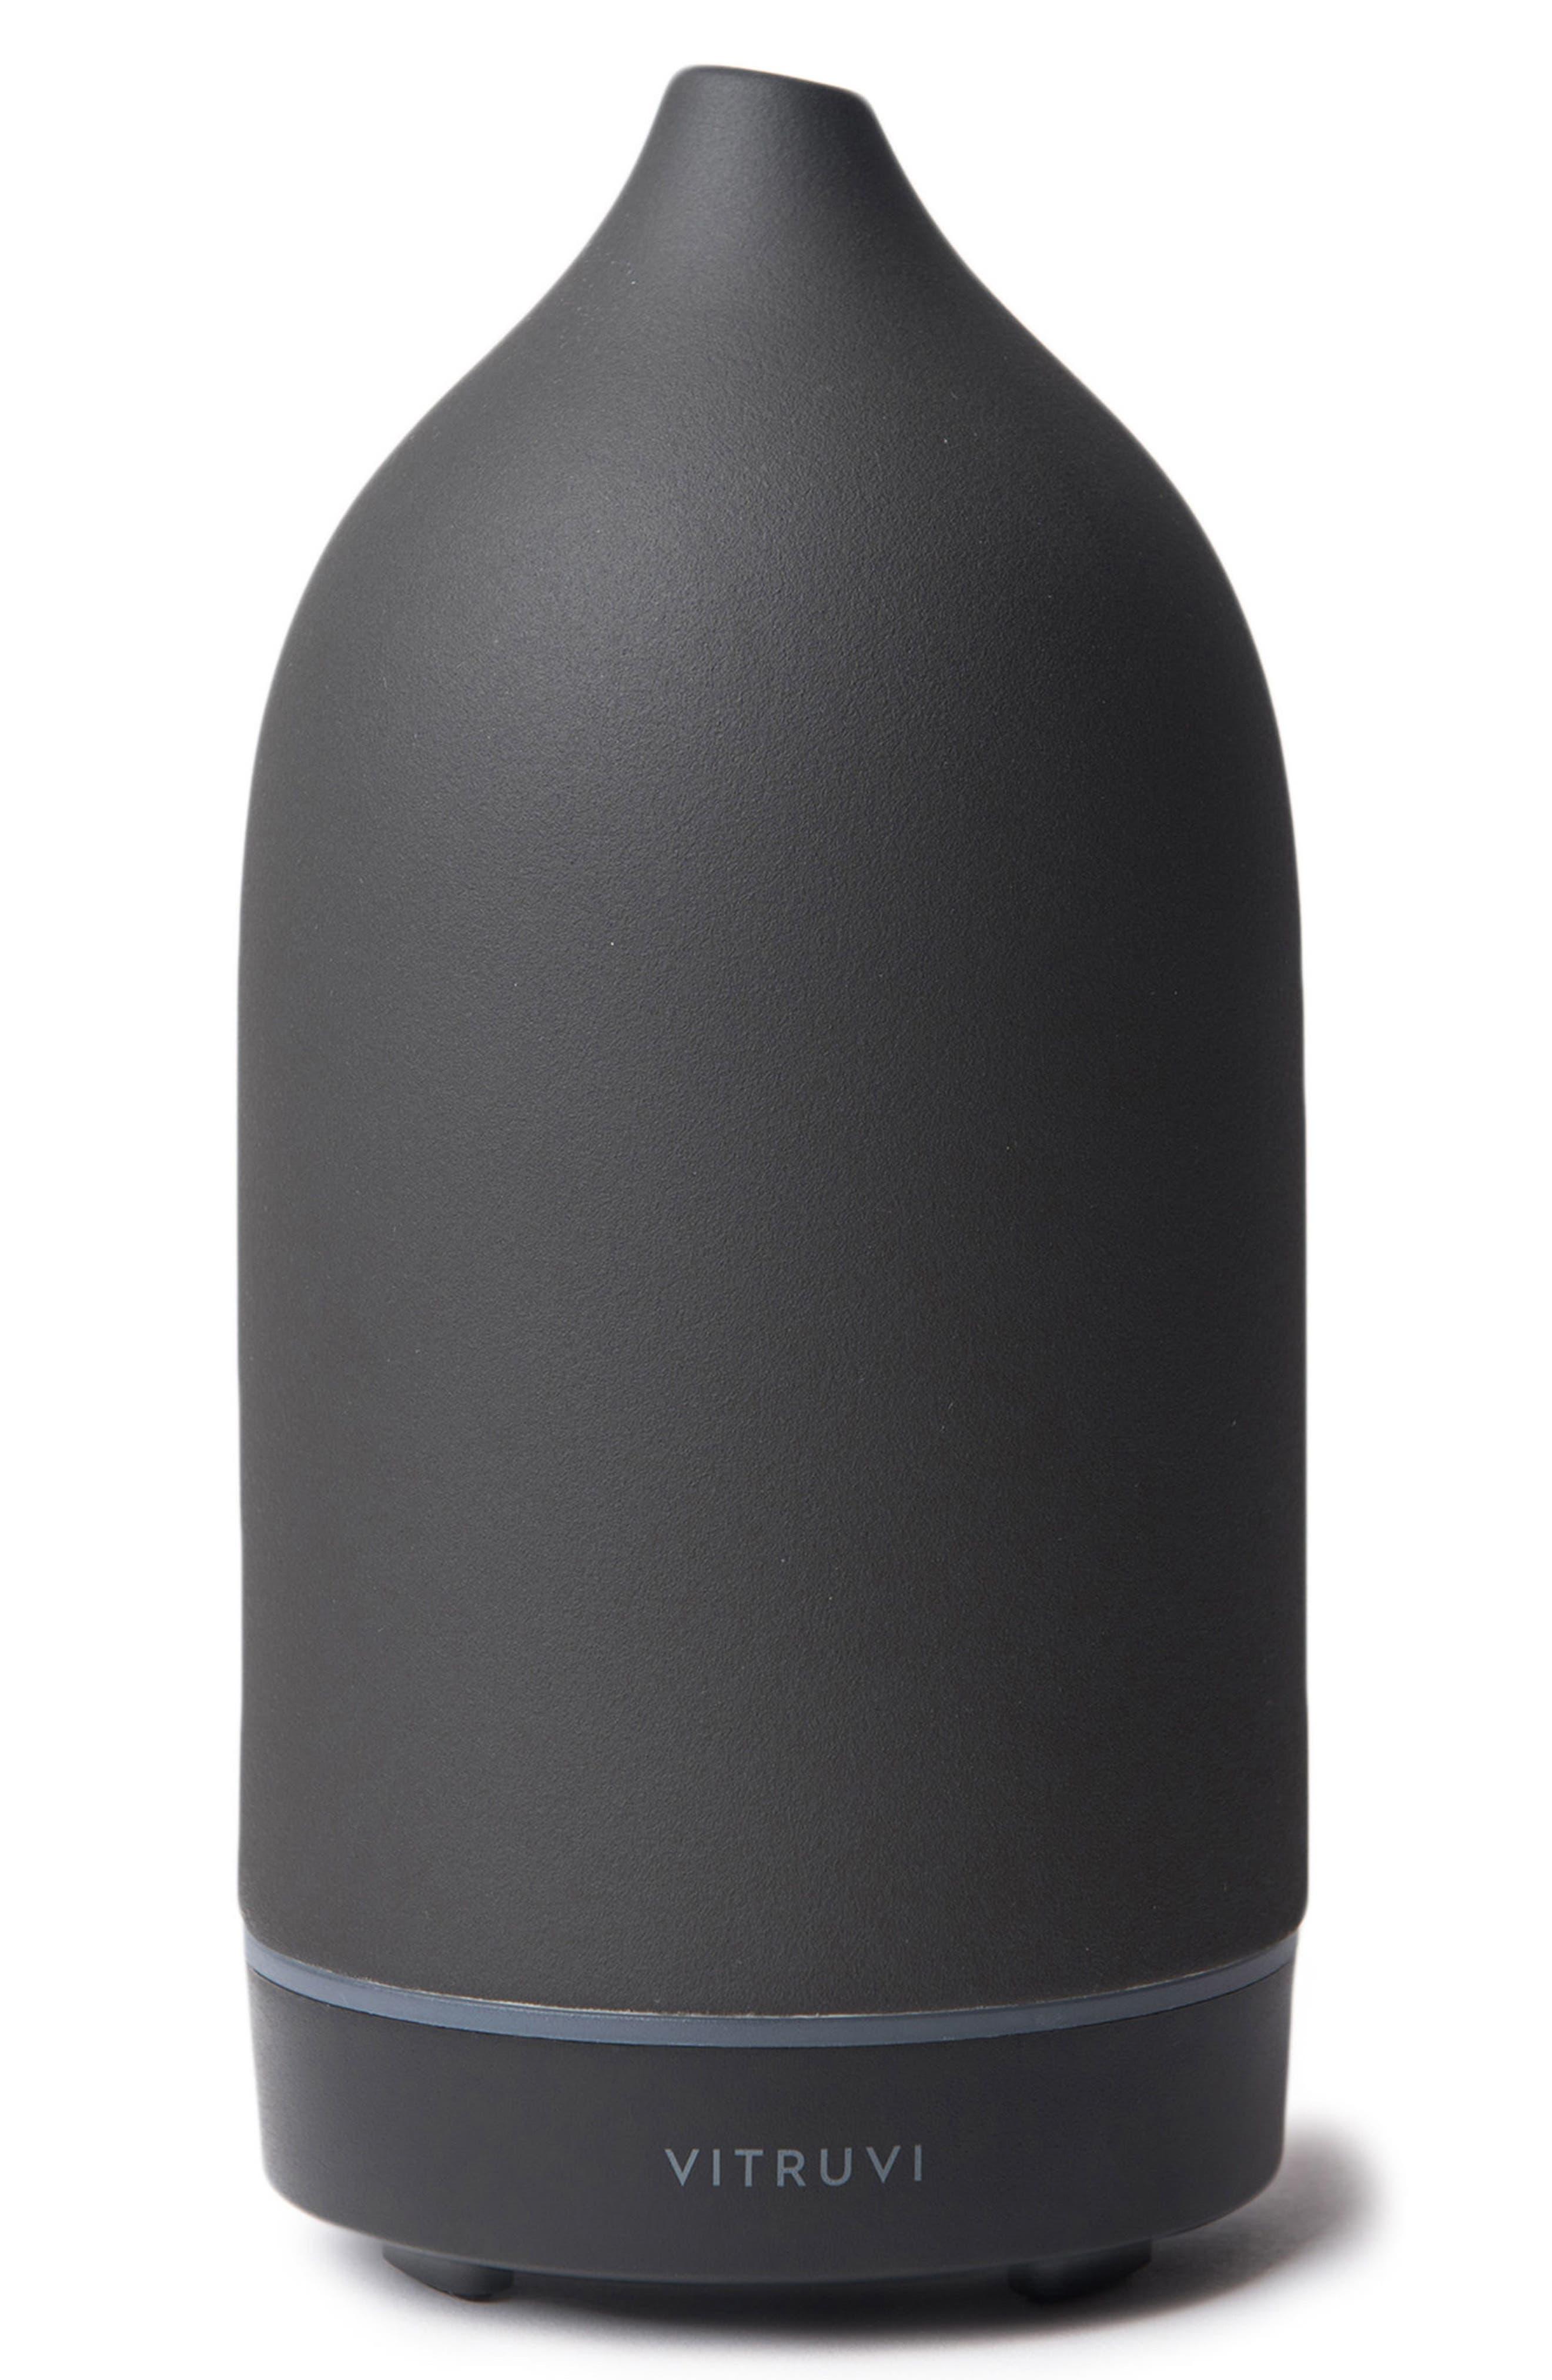 Alternate Image 1 Selected - Vitruvi Porcelain Essential Oil Diffuser